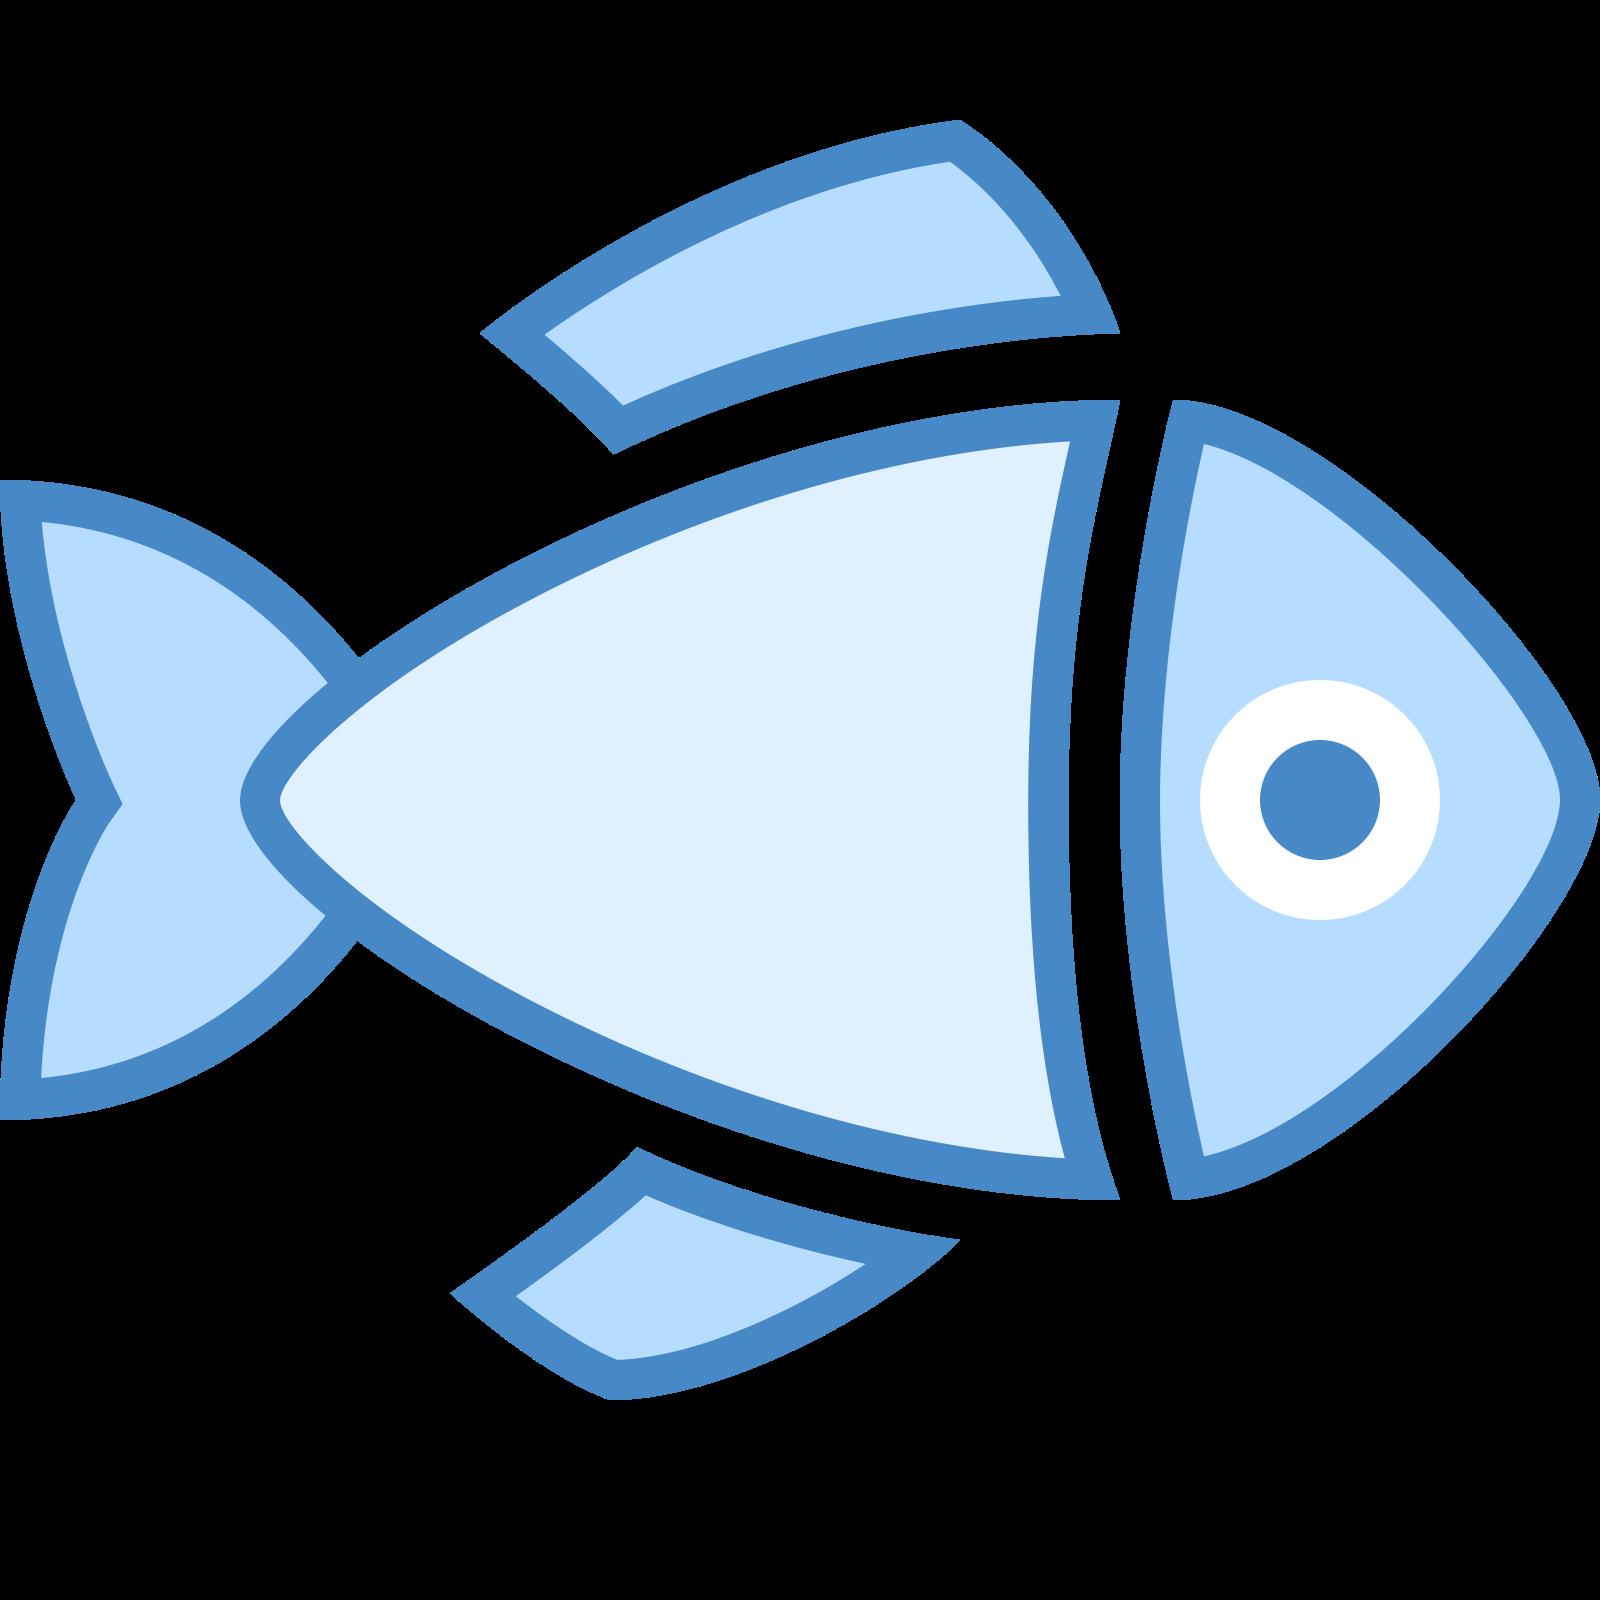 Ryba oporządzona icon